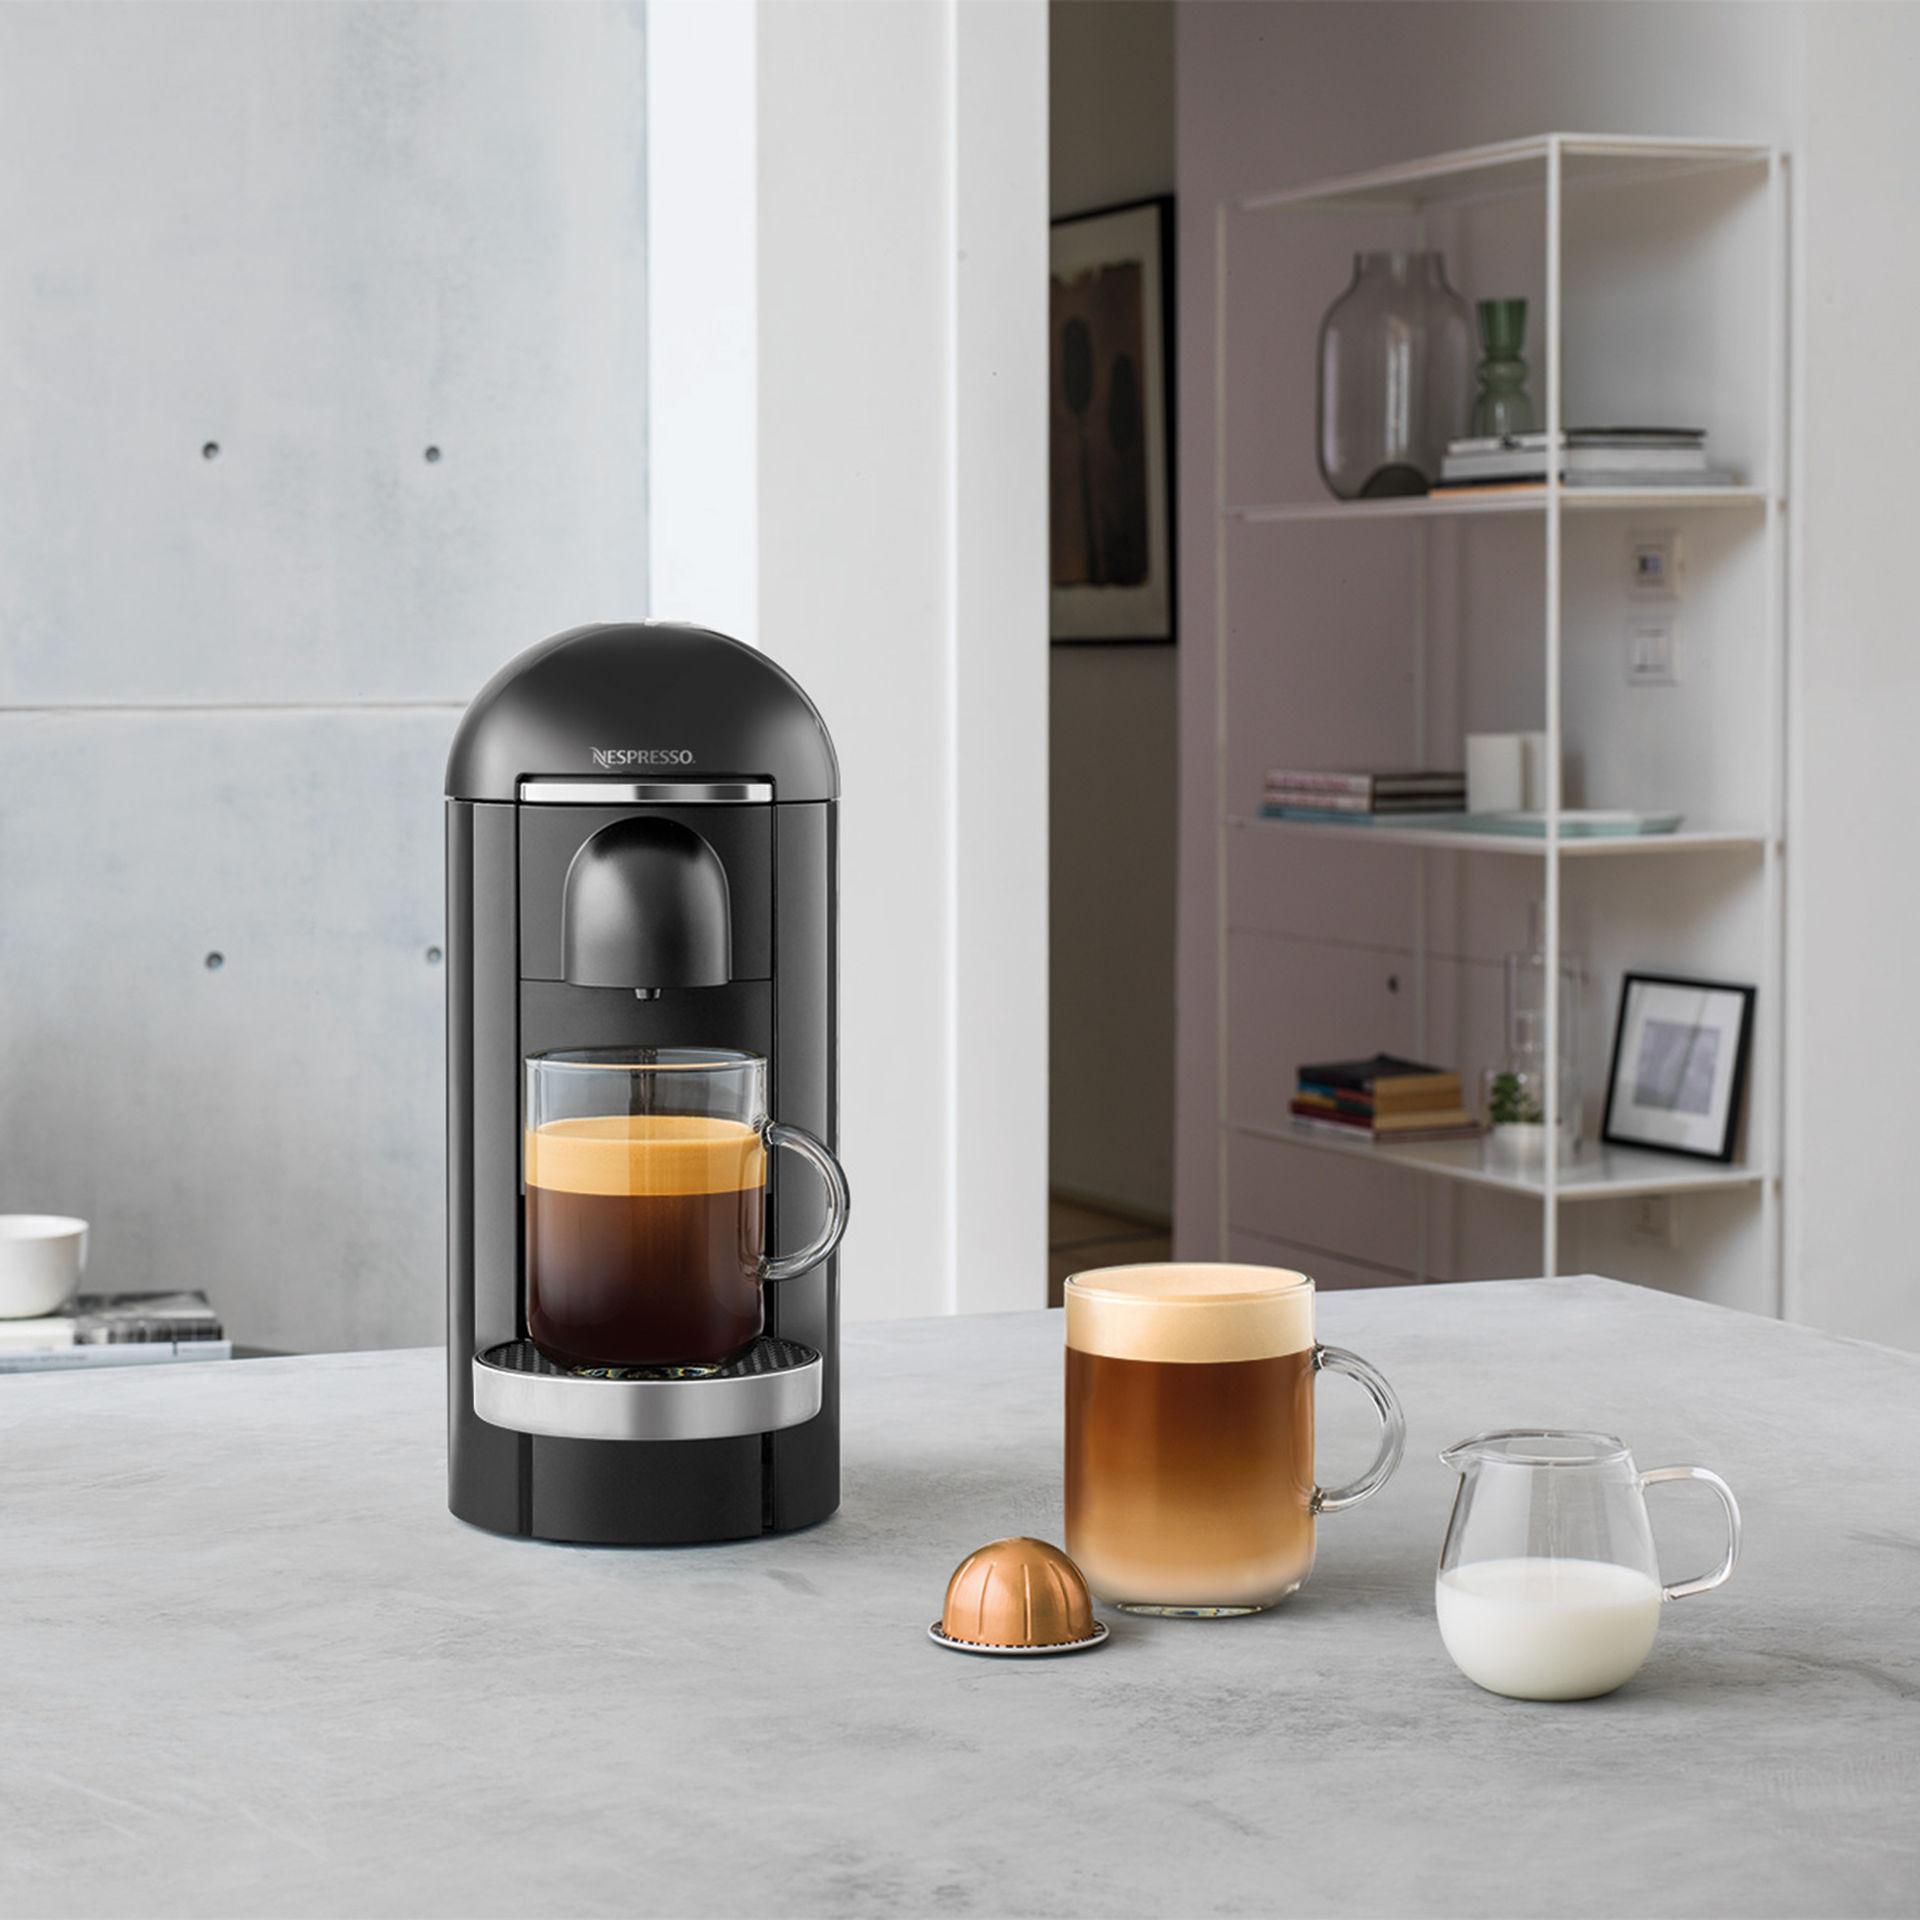 Ny Nespresso-maskin kan brygga 25 sorters kaffe